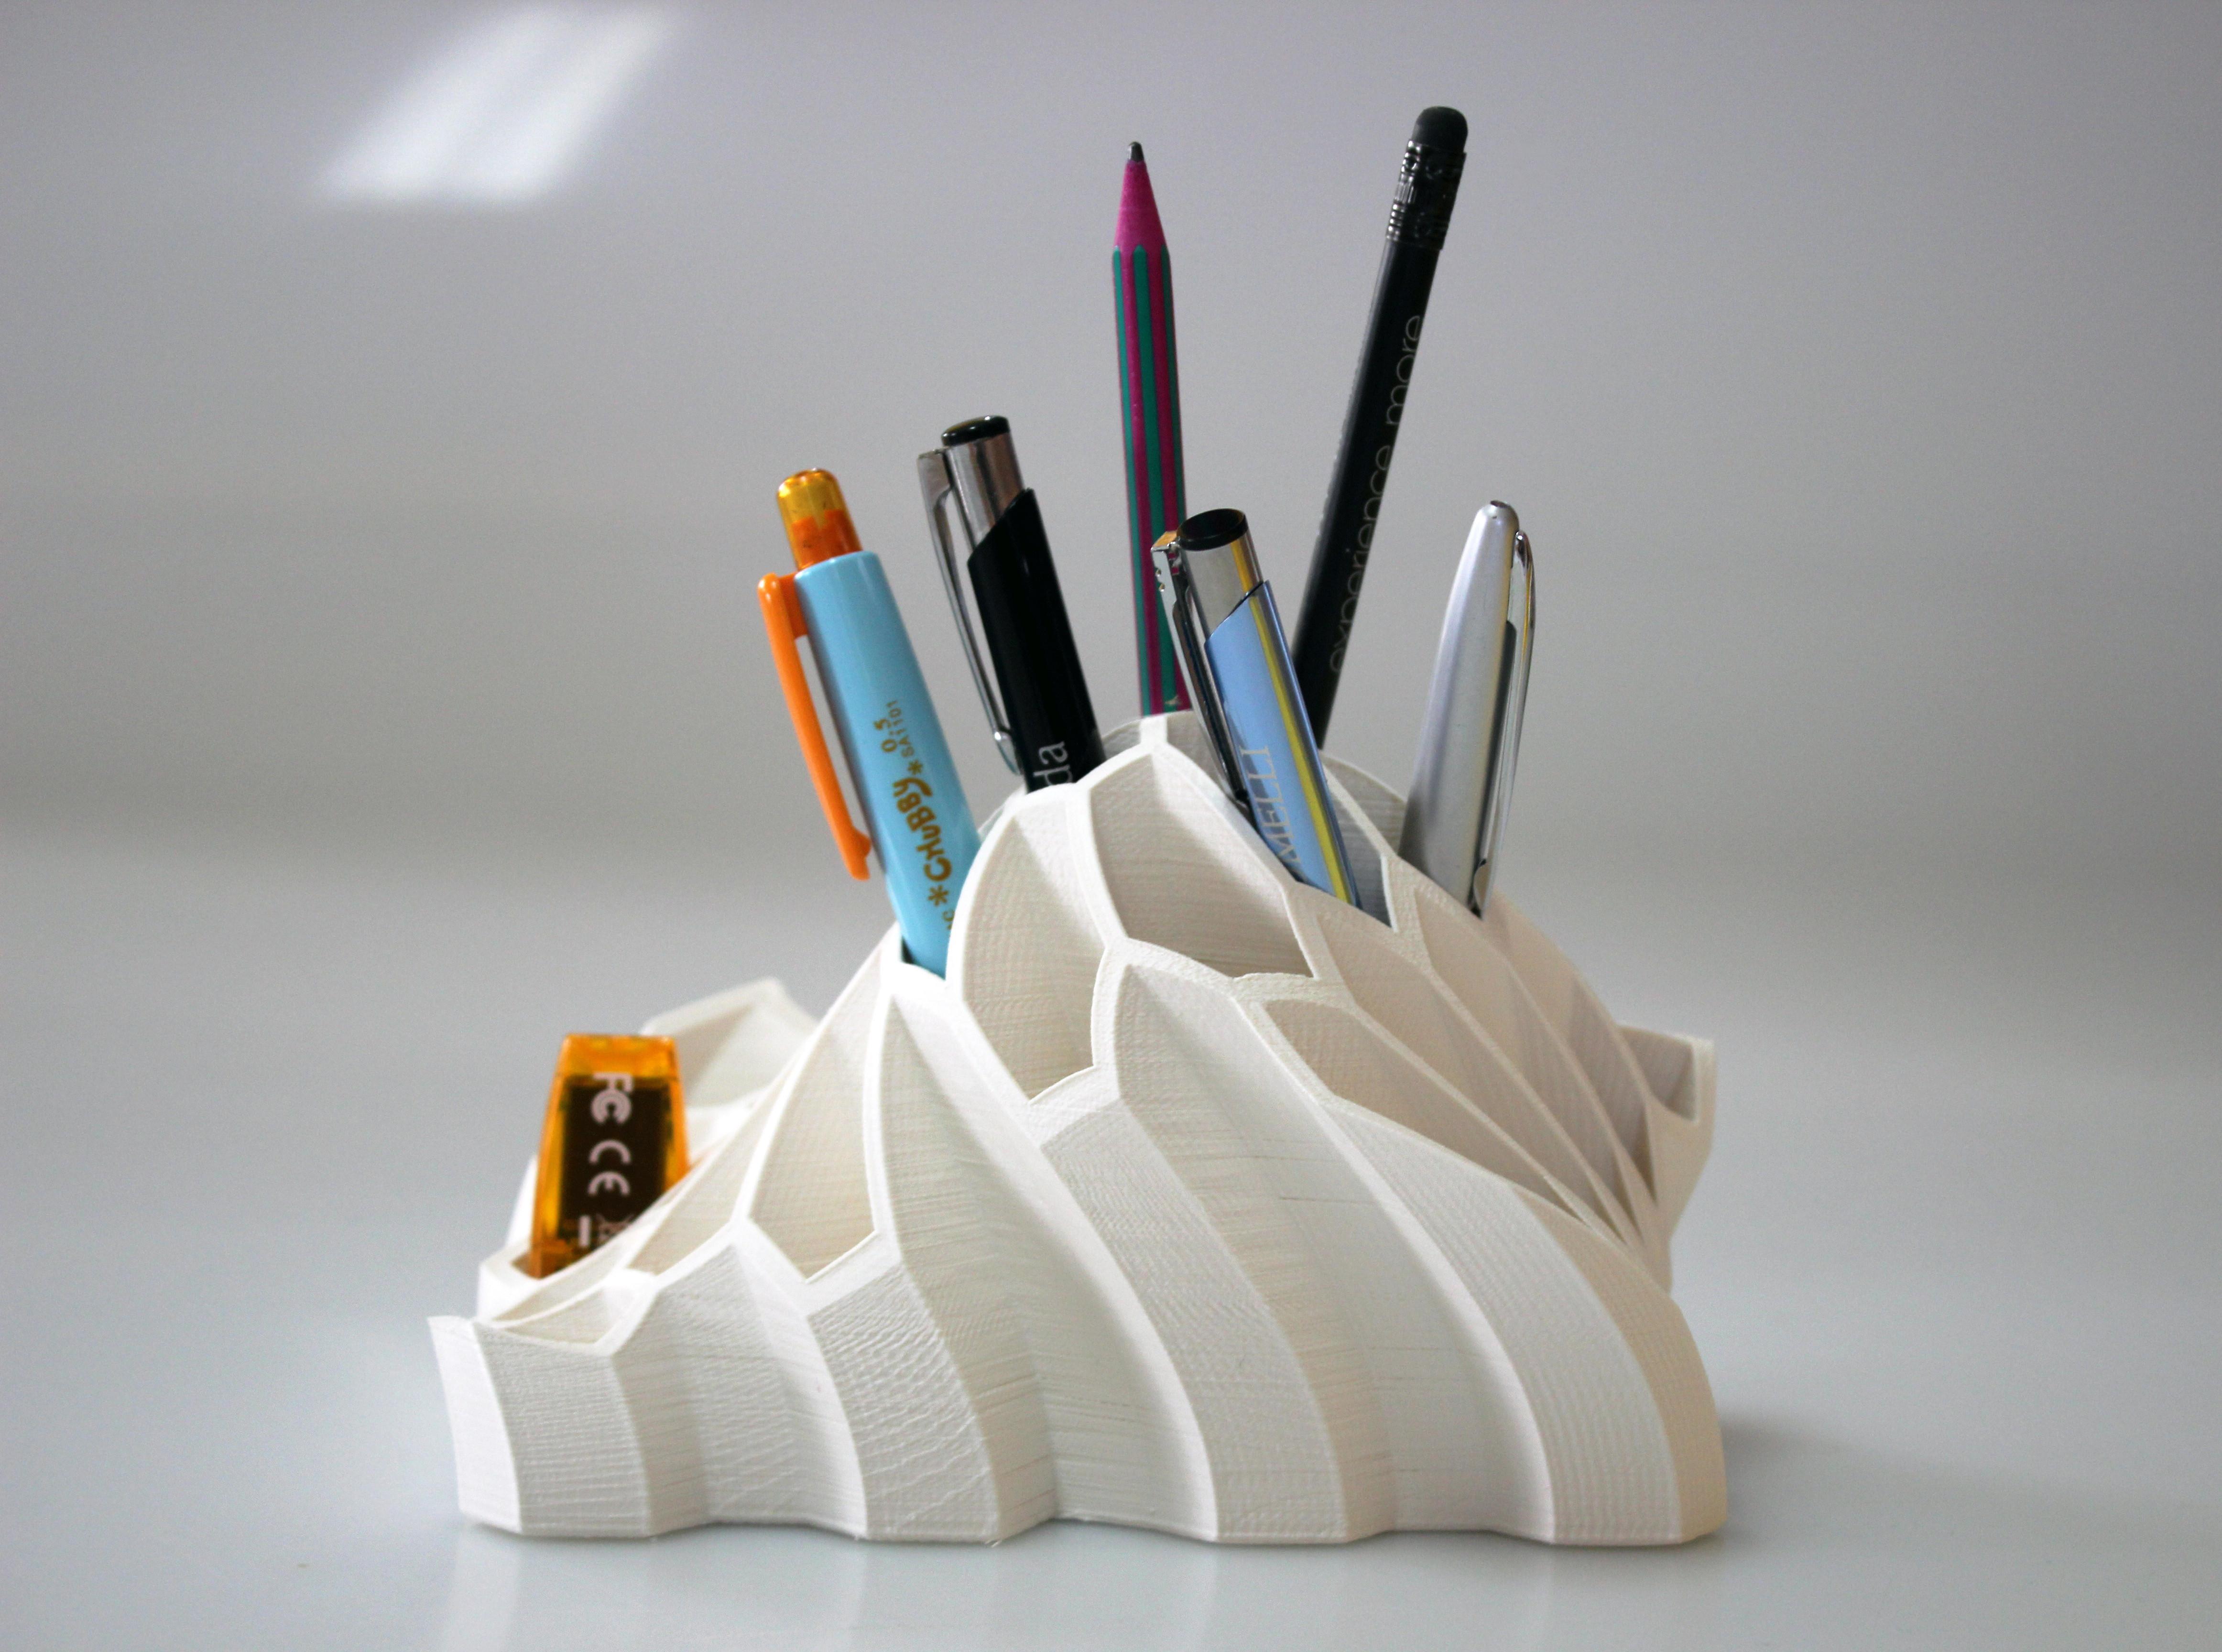 Free 3D Printer Designs Pen And Pencil Holder ・ Cults - Free 3D Printable Models